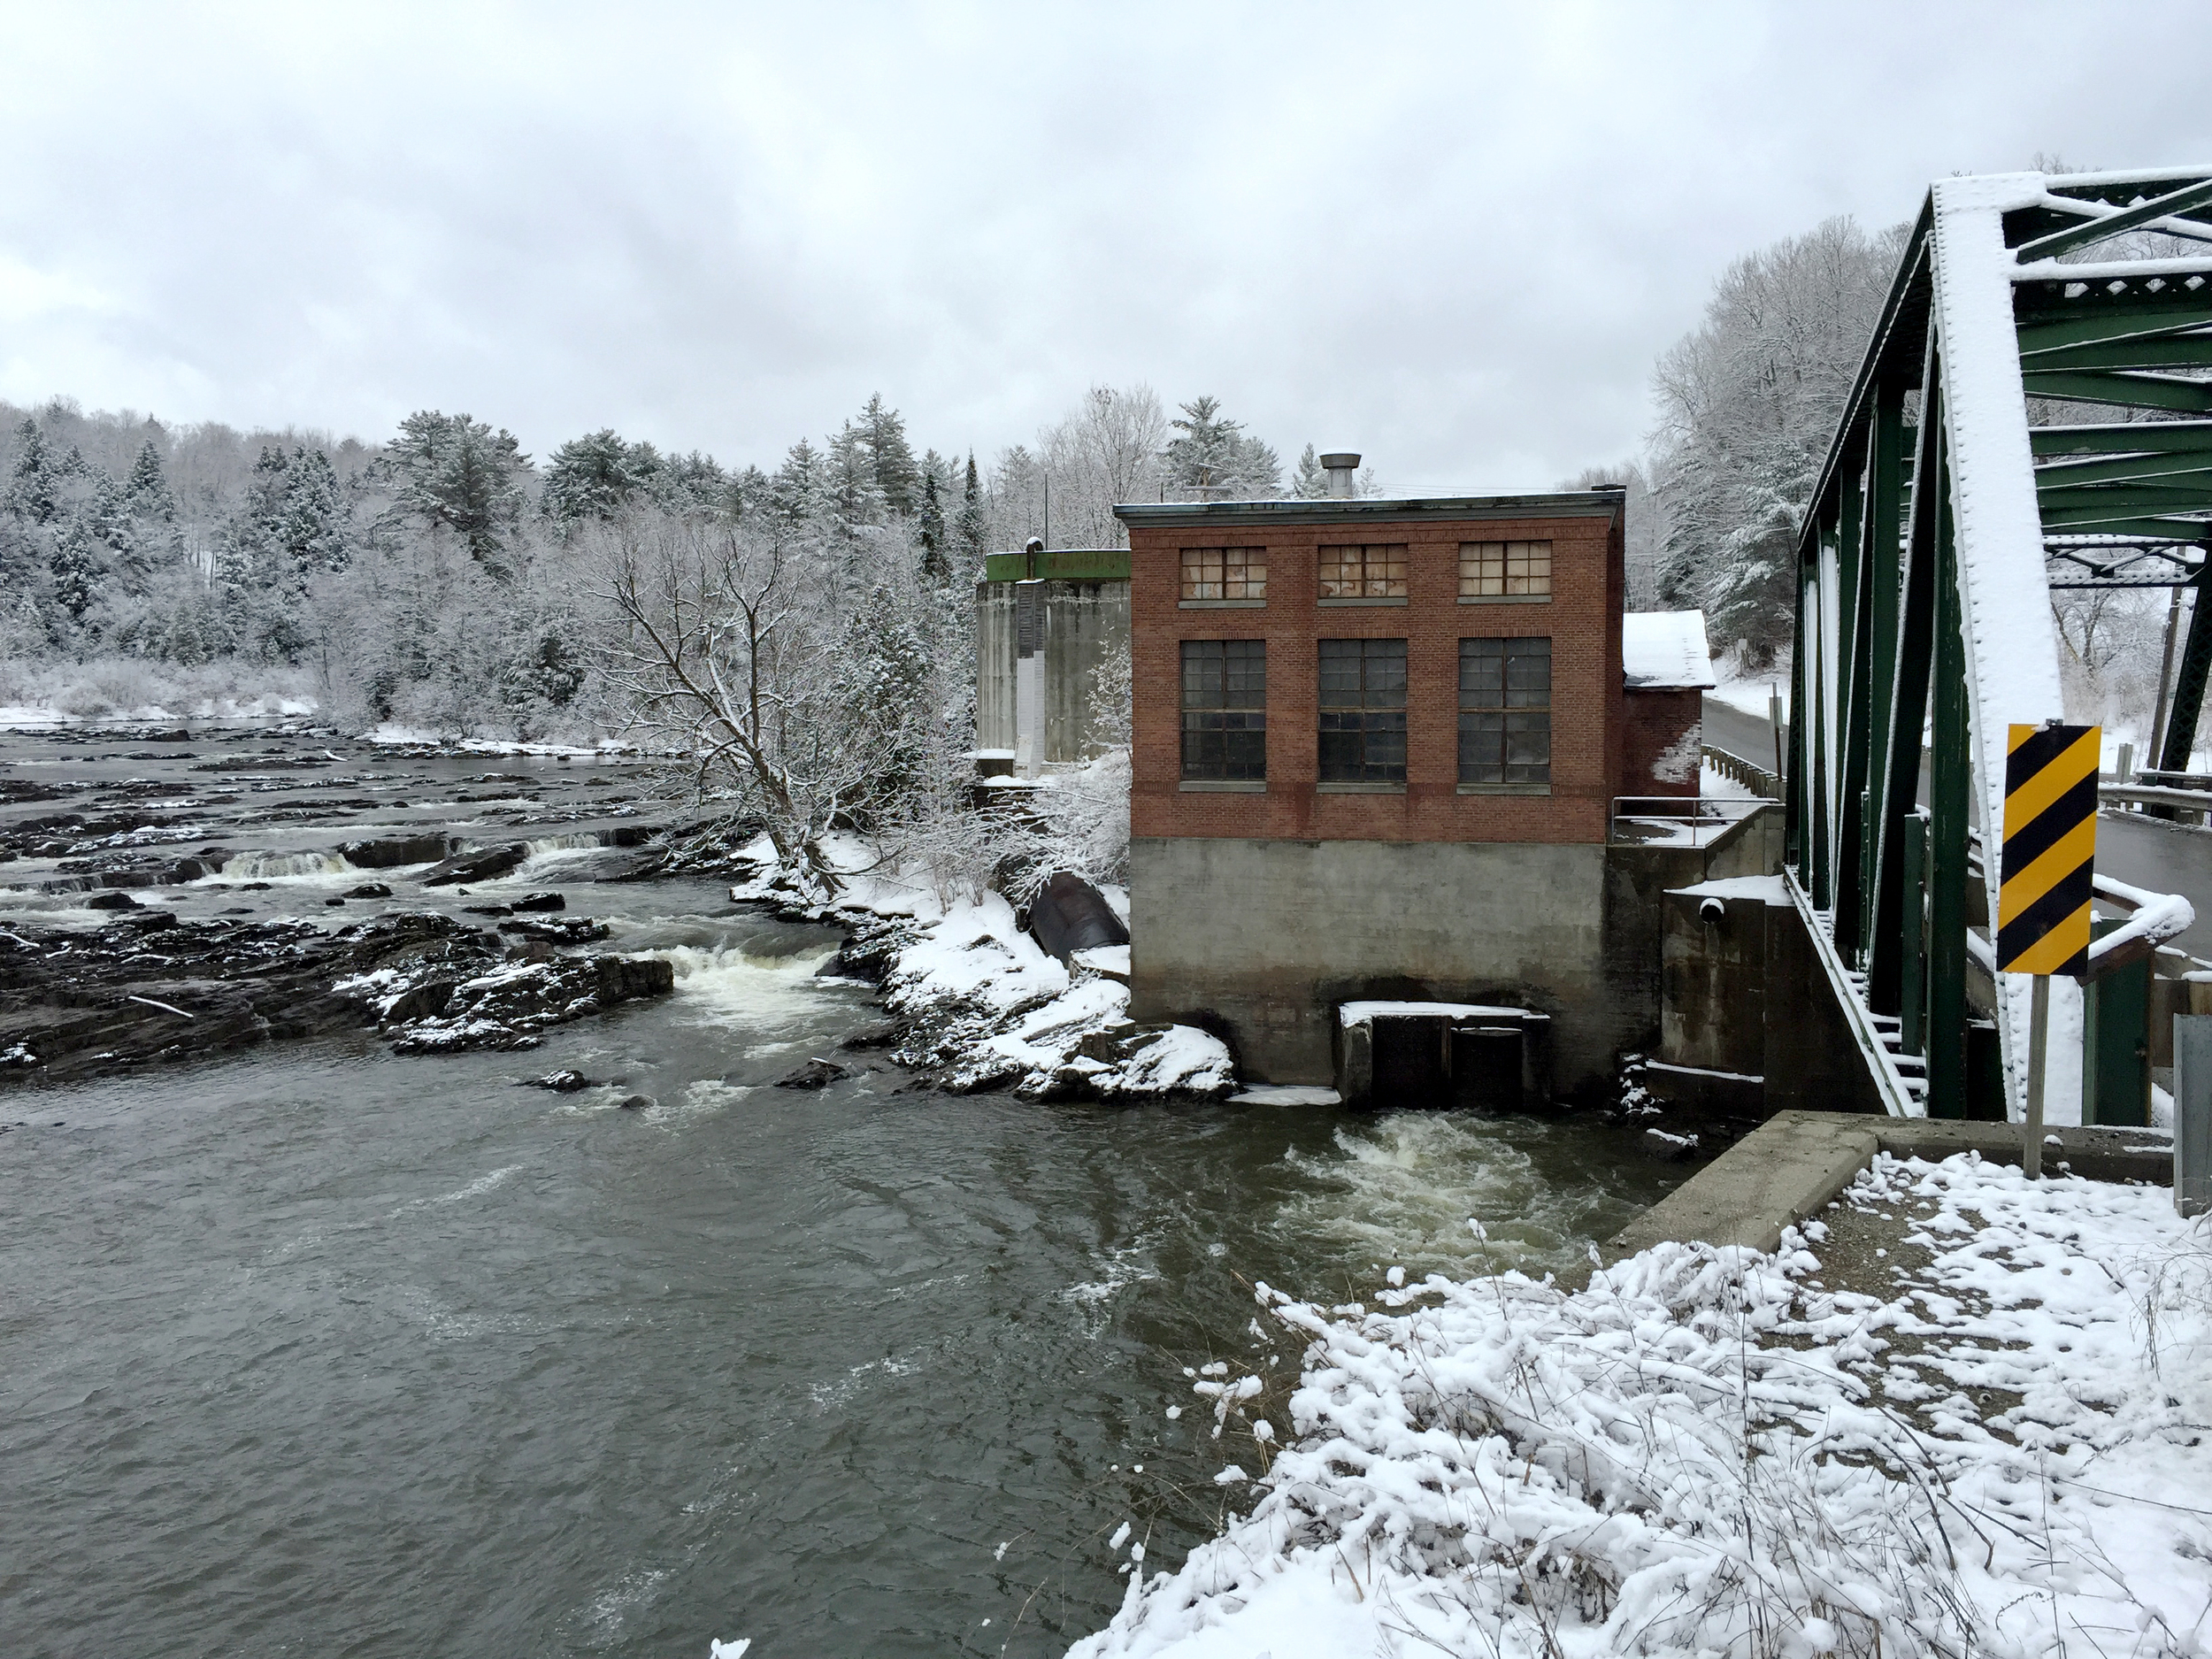 Cady's Falls Bridge over the Lamoille River